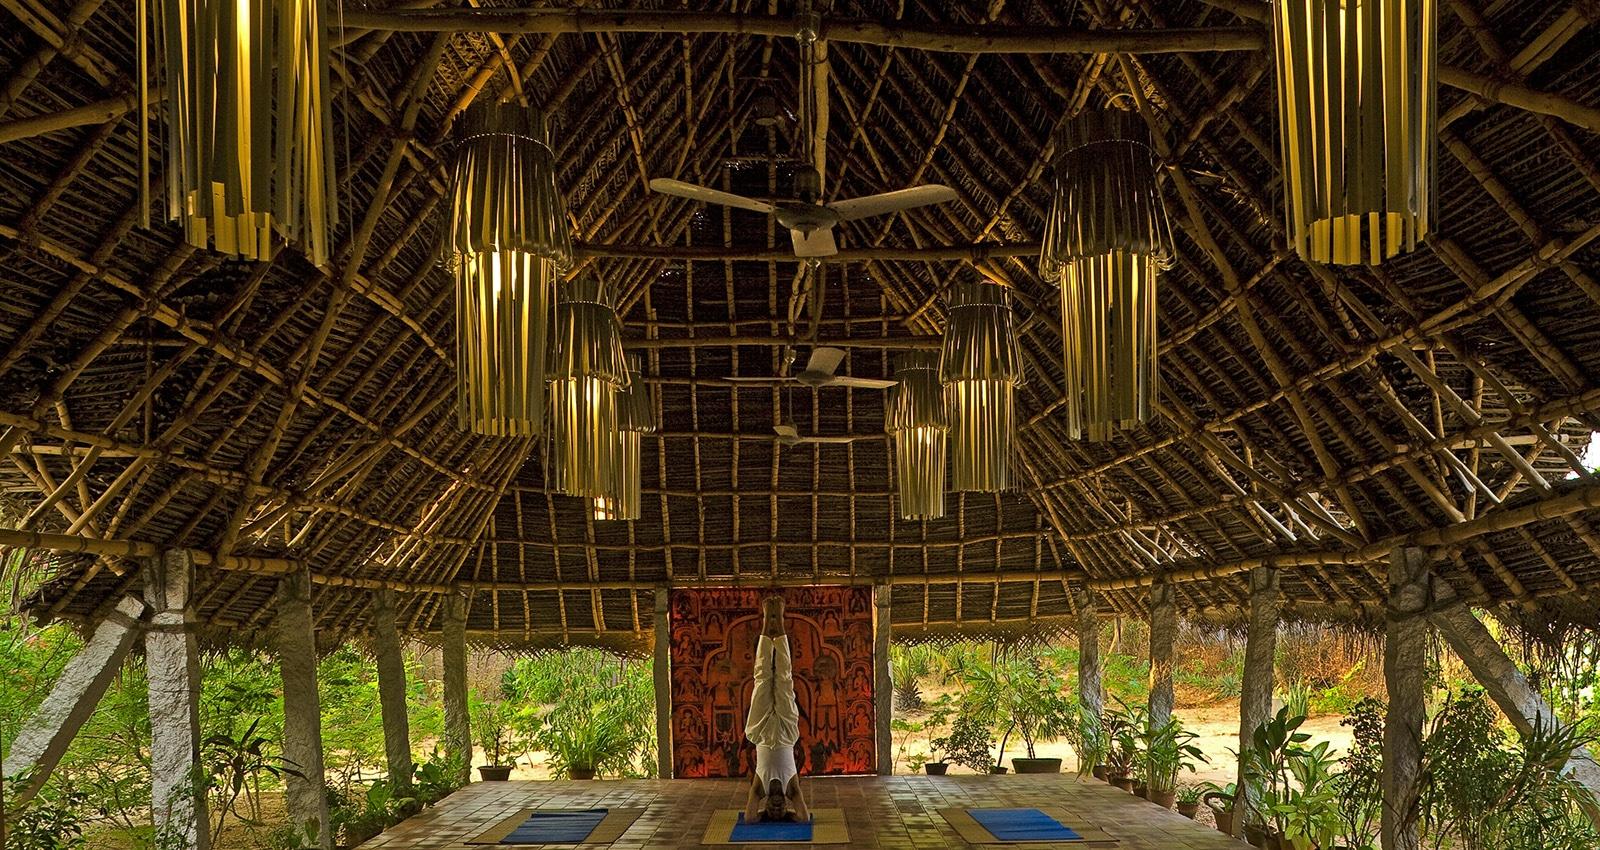 Image of the Yoga Hall at Chopta healing center at Dune eco village and Spa near Puduchery